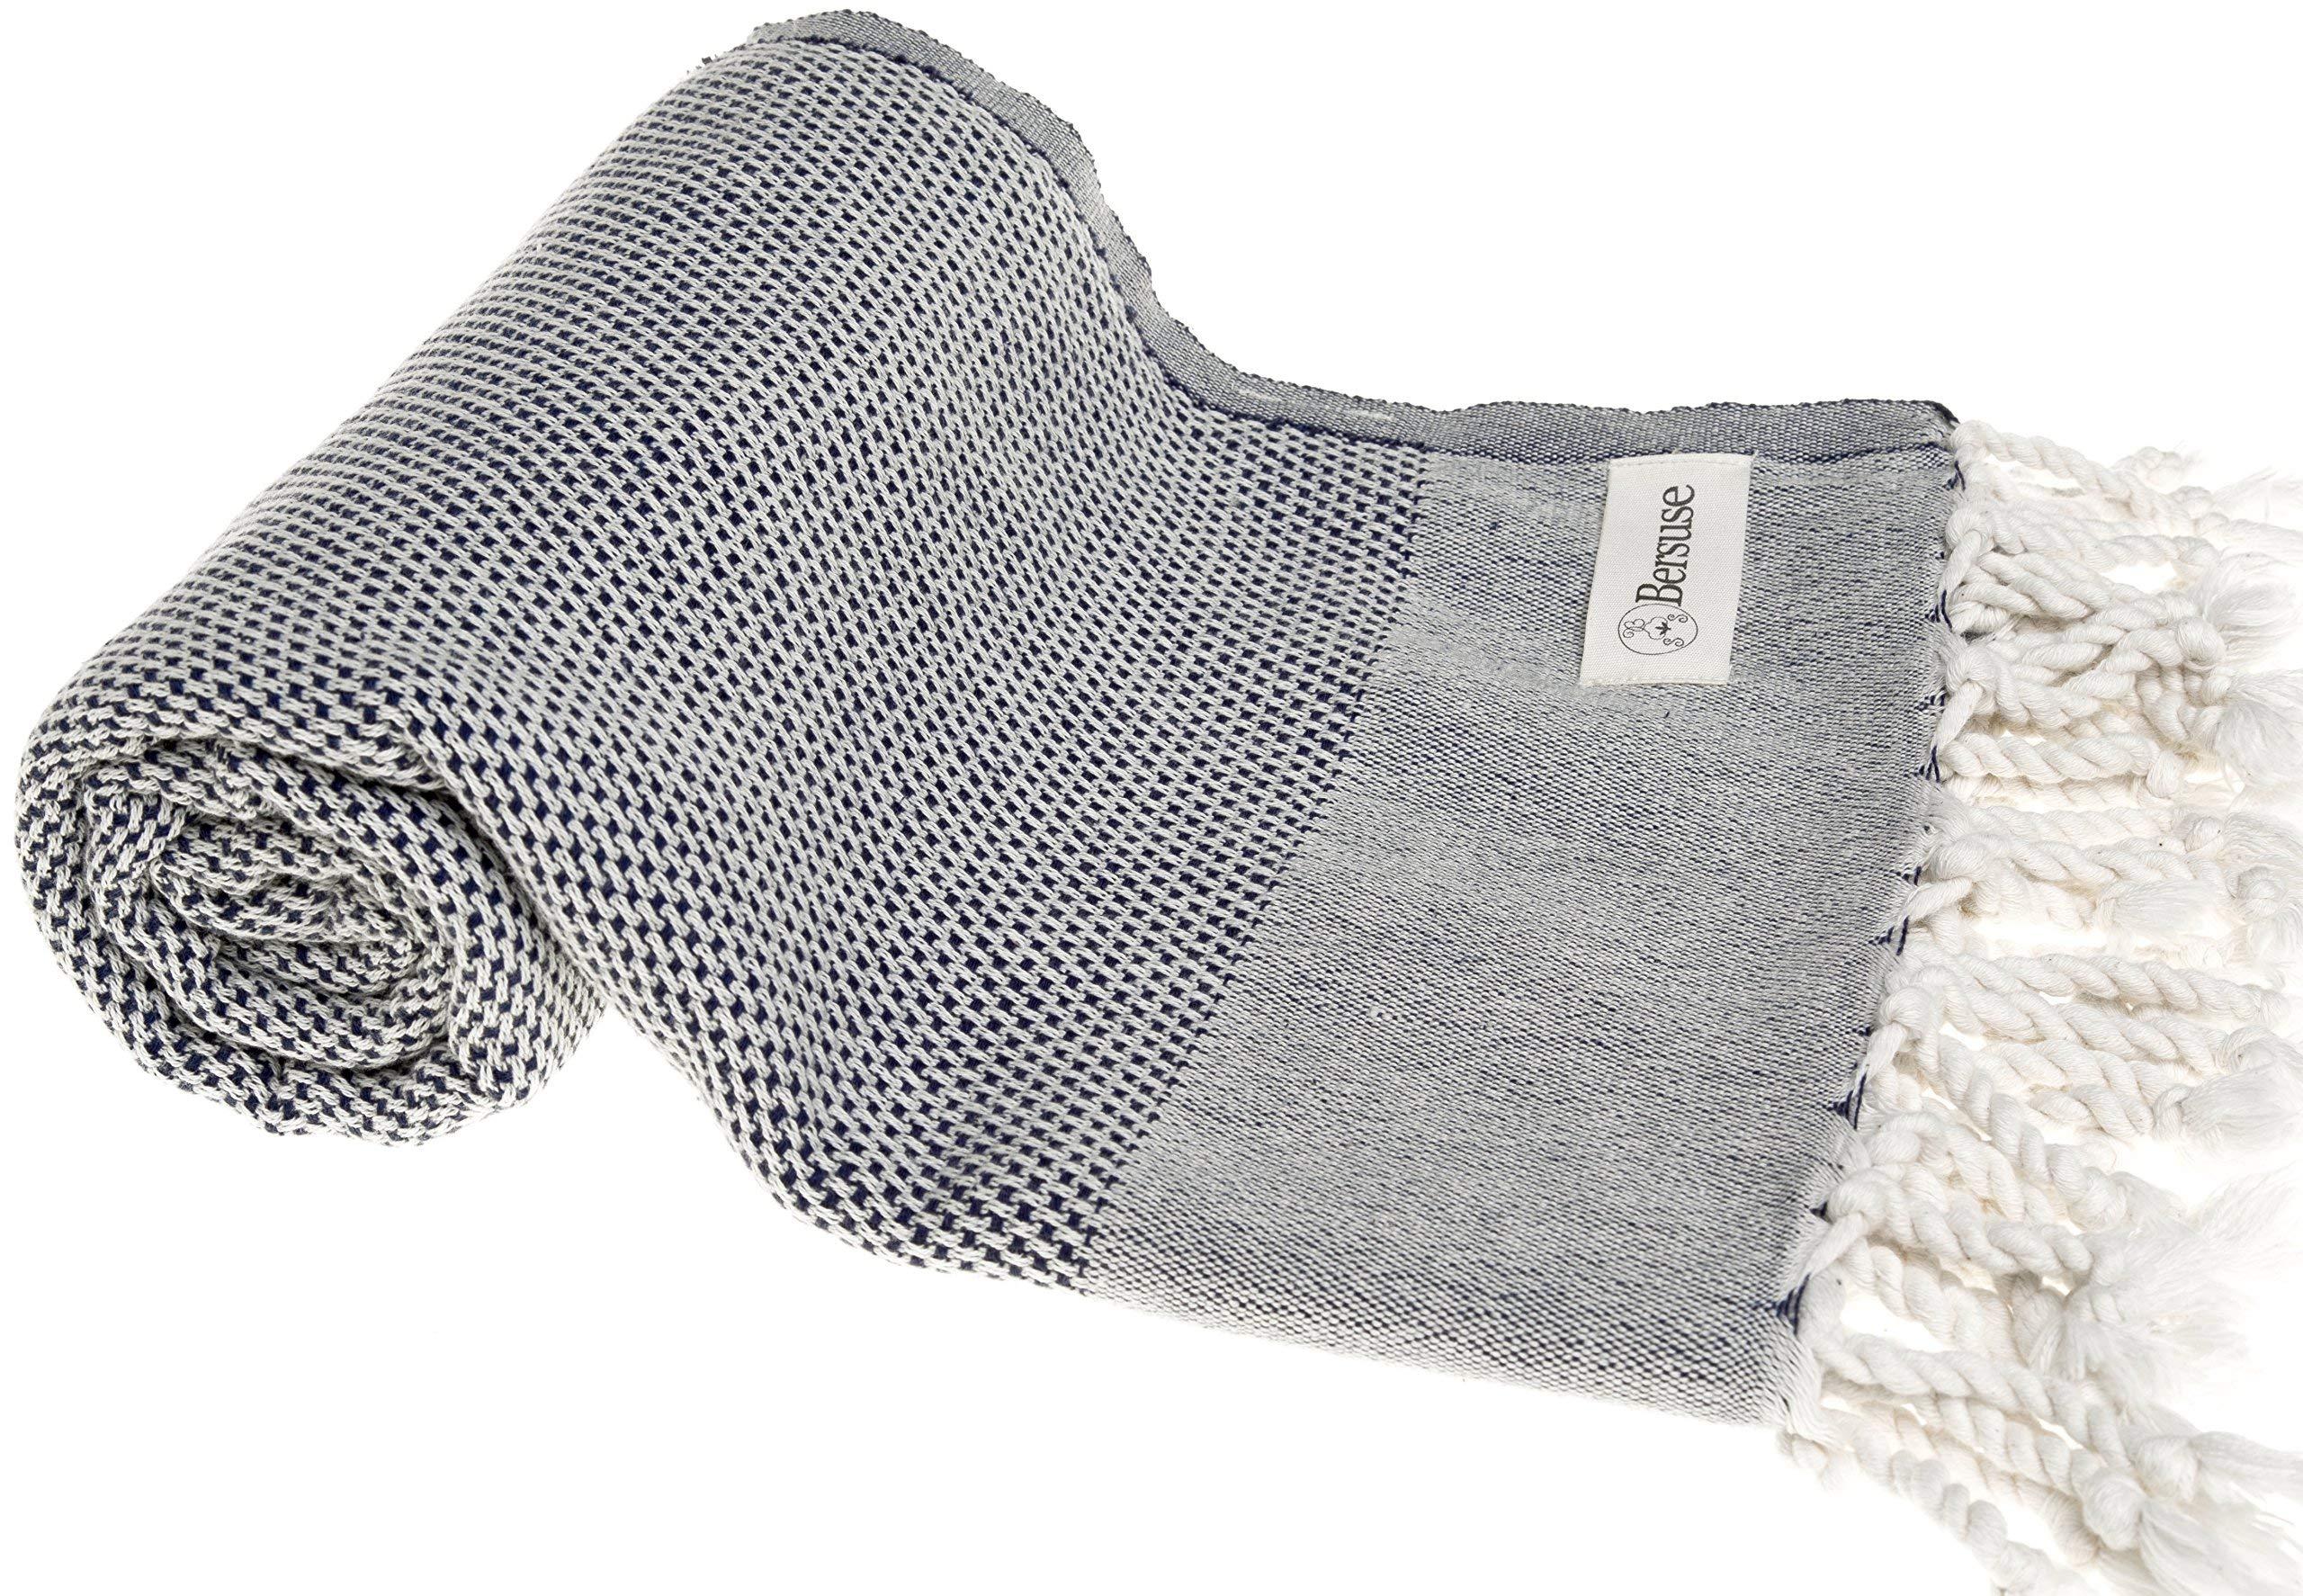 Bersuse 100% Cotton Ventura Handloom Turkish Towel-37X70, Dark Blue, 37x70 Inches